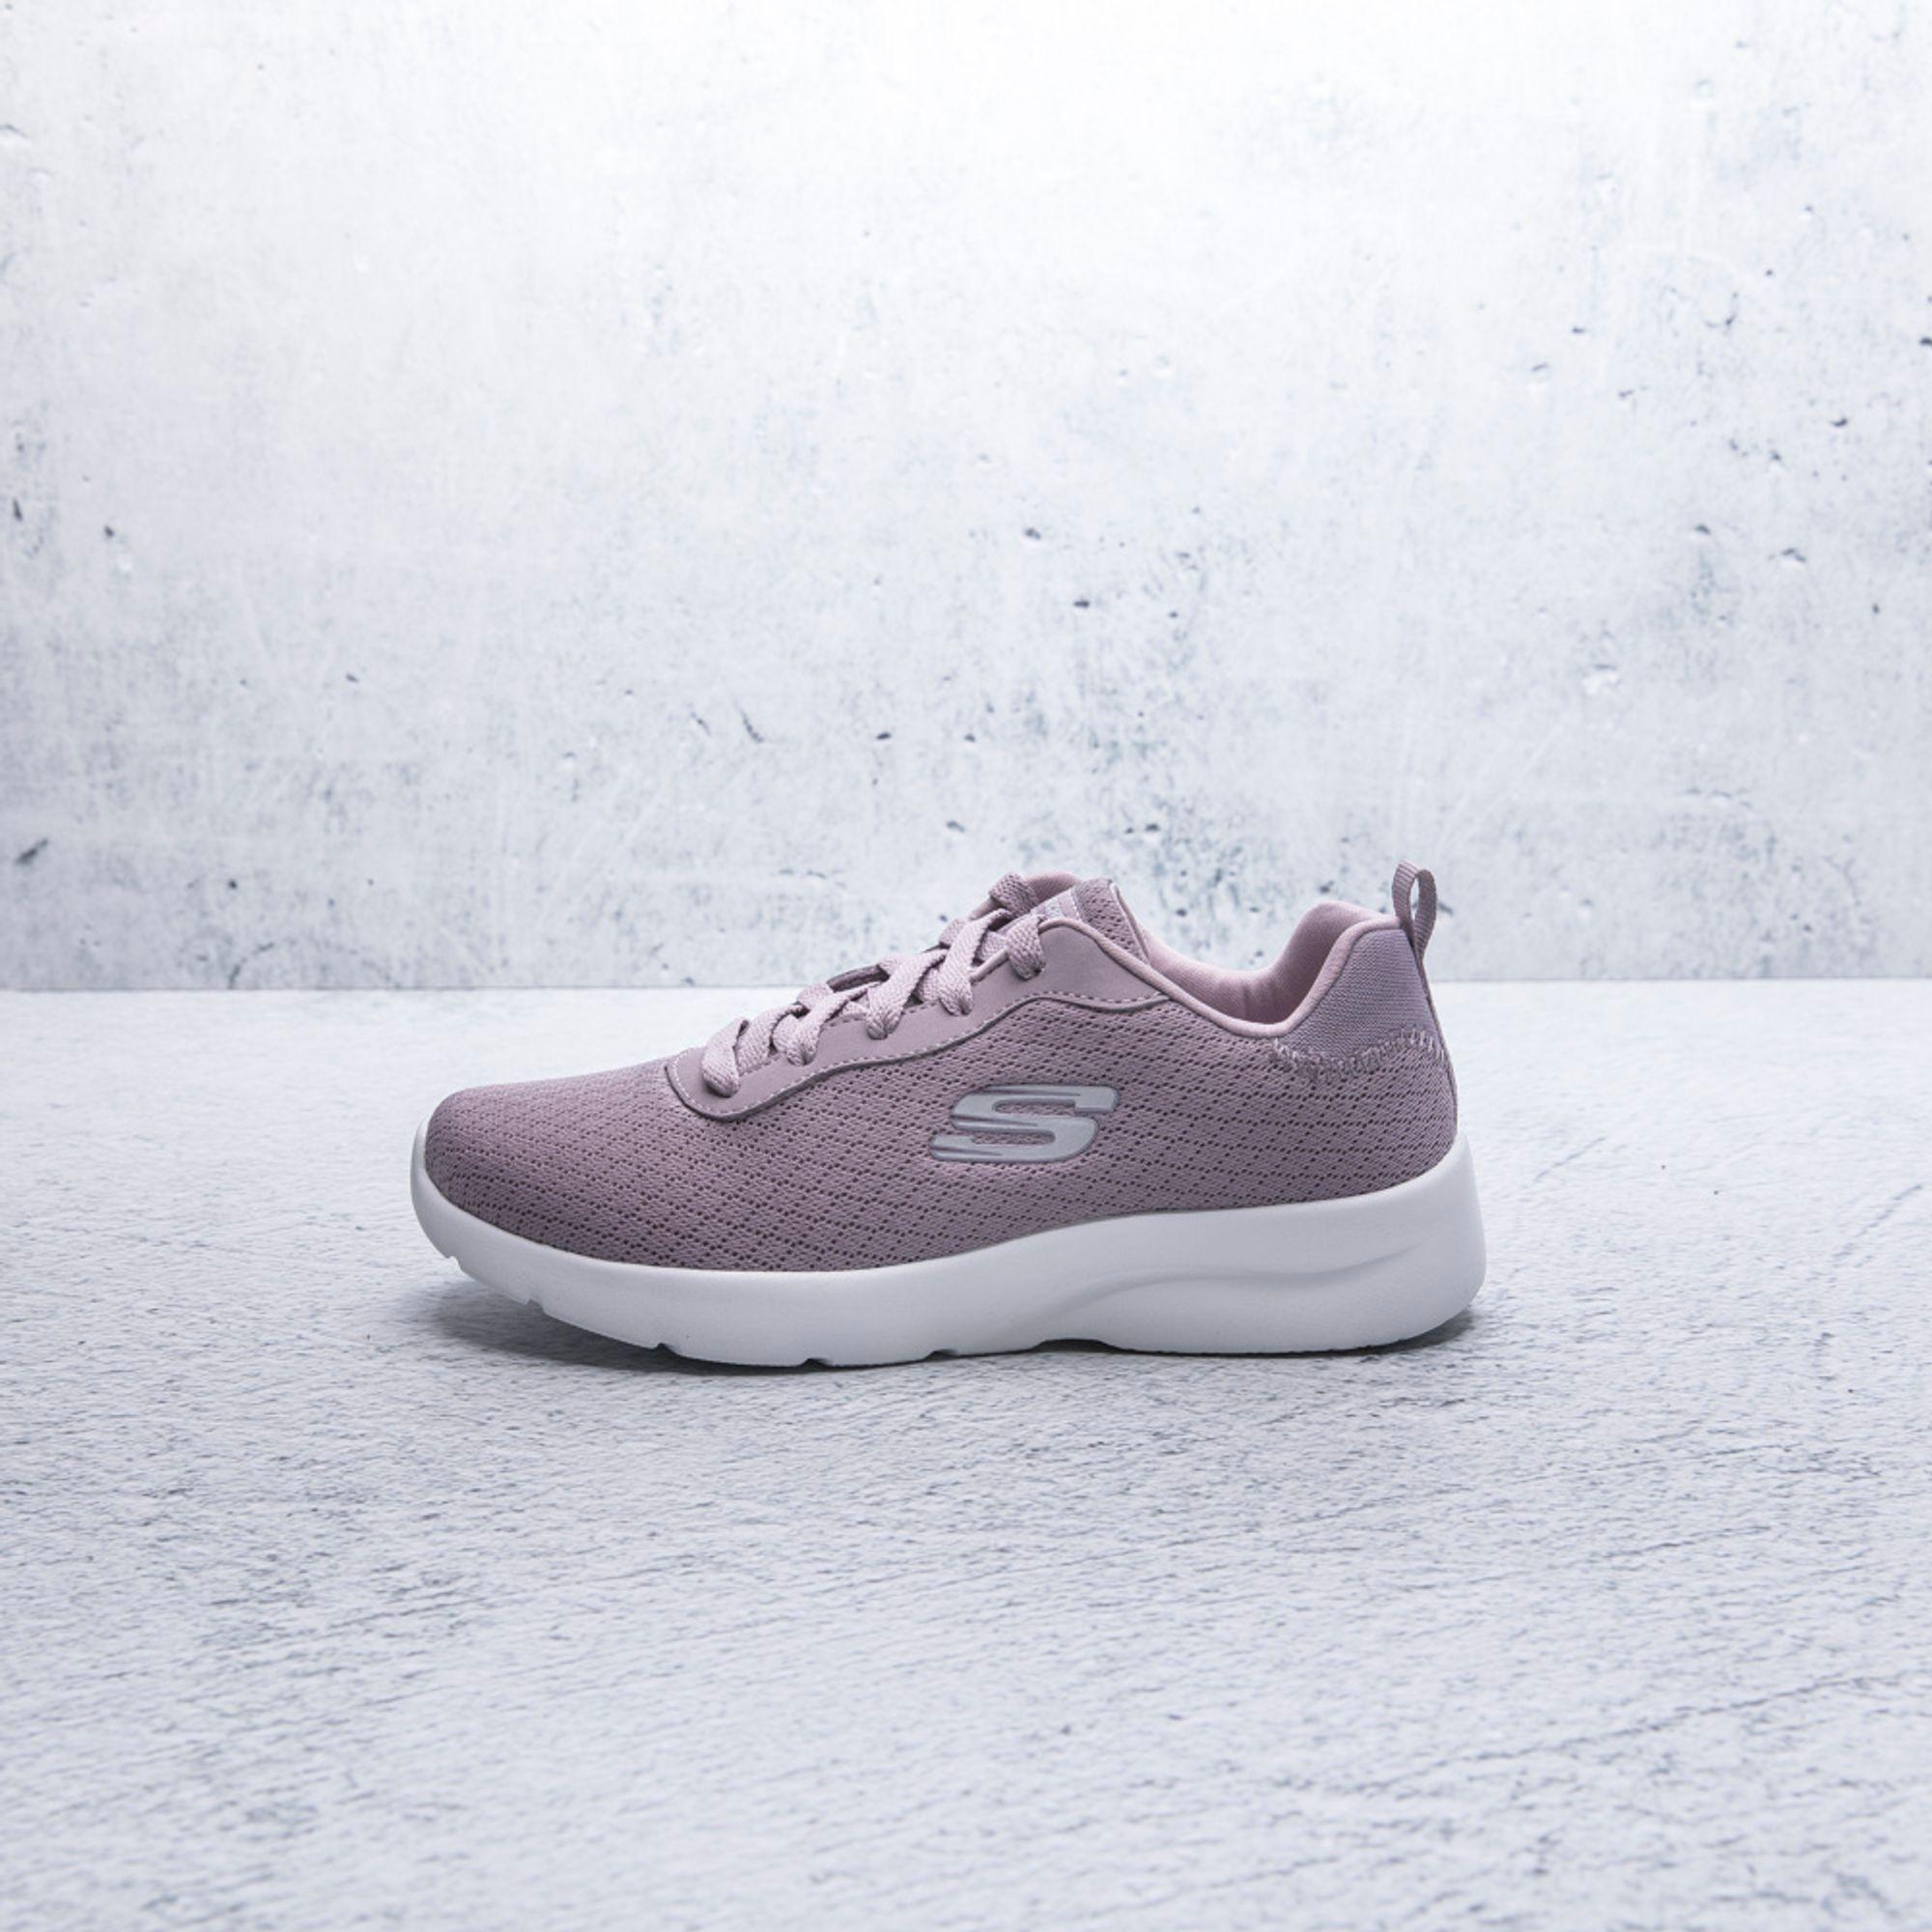 Tenis-Skechers-mujer-12964LAV